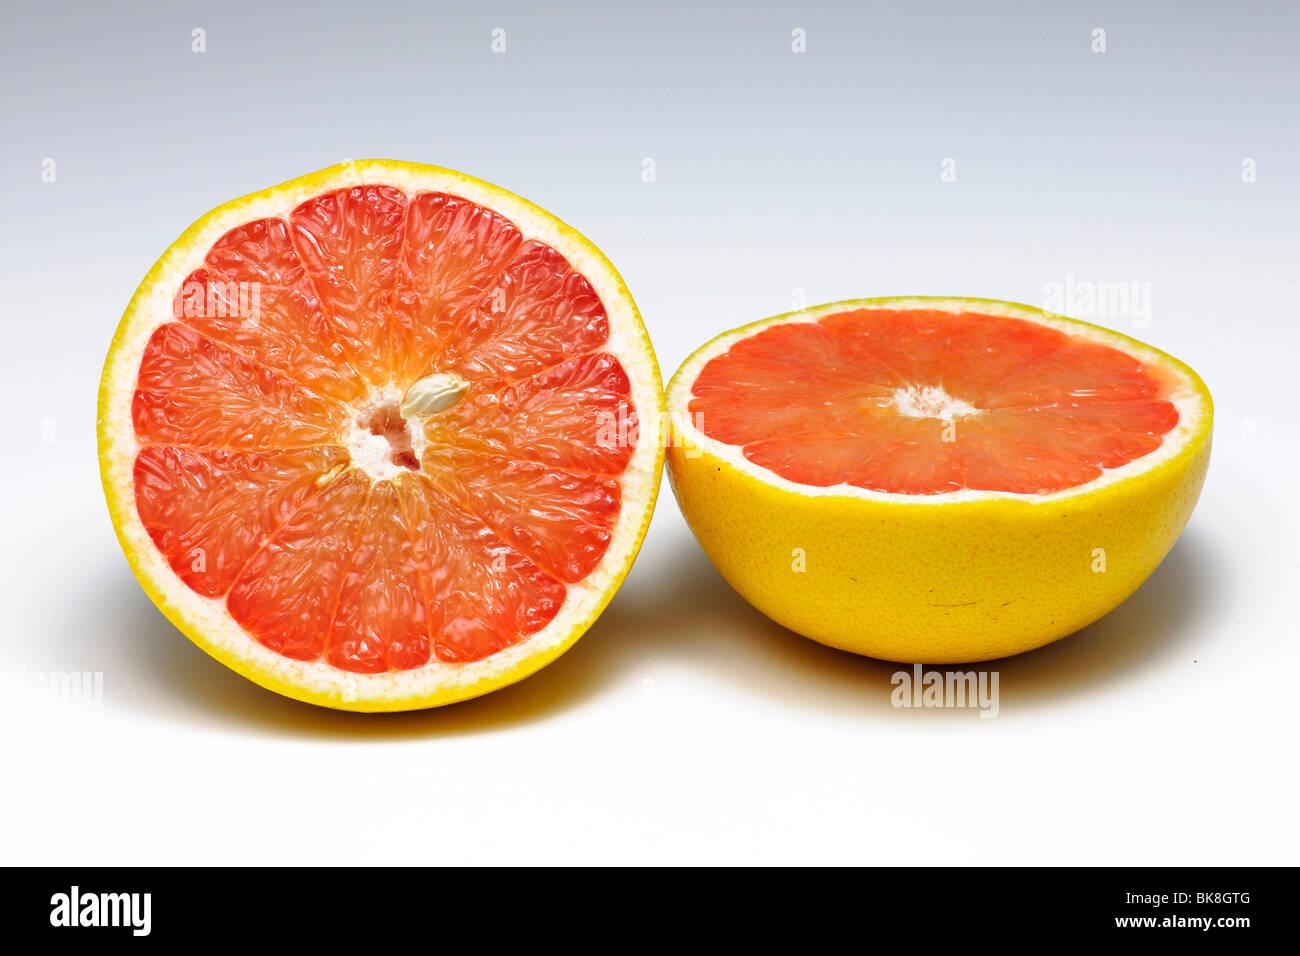 Red grapefruit (Citrus paradisi) cut into halves Stock Photo